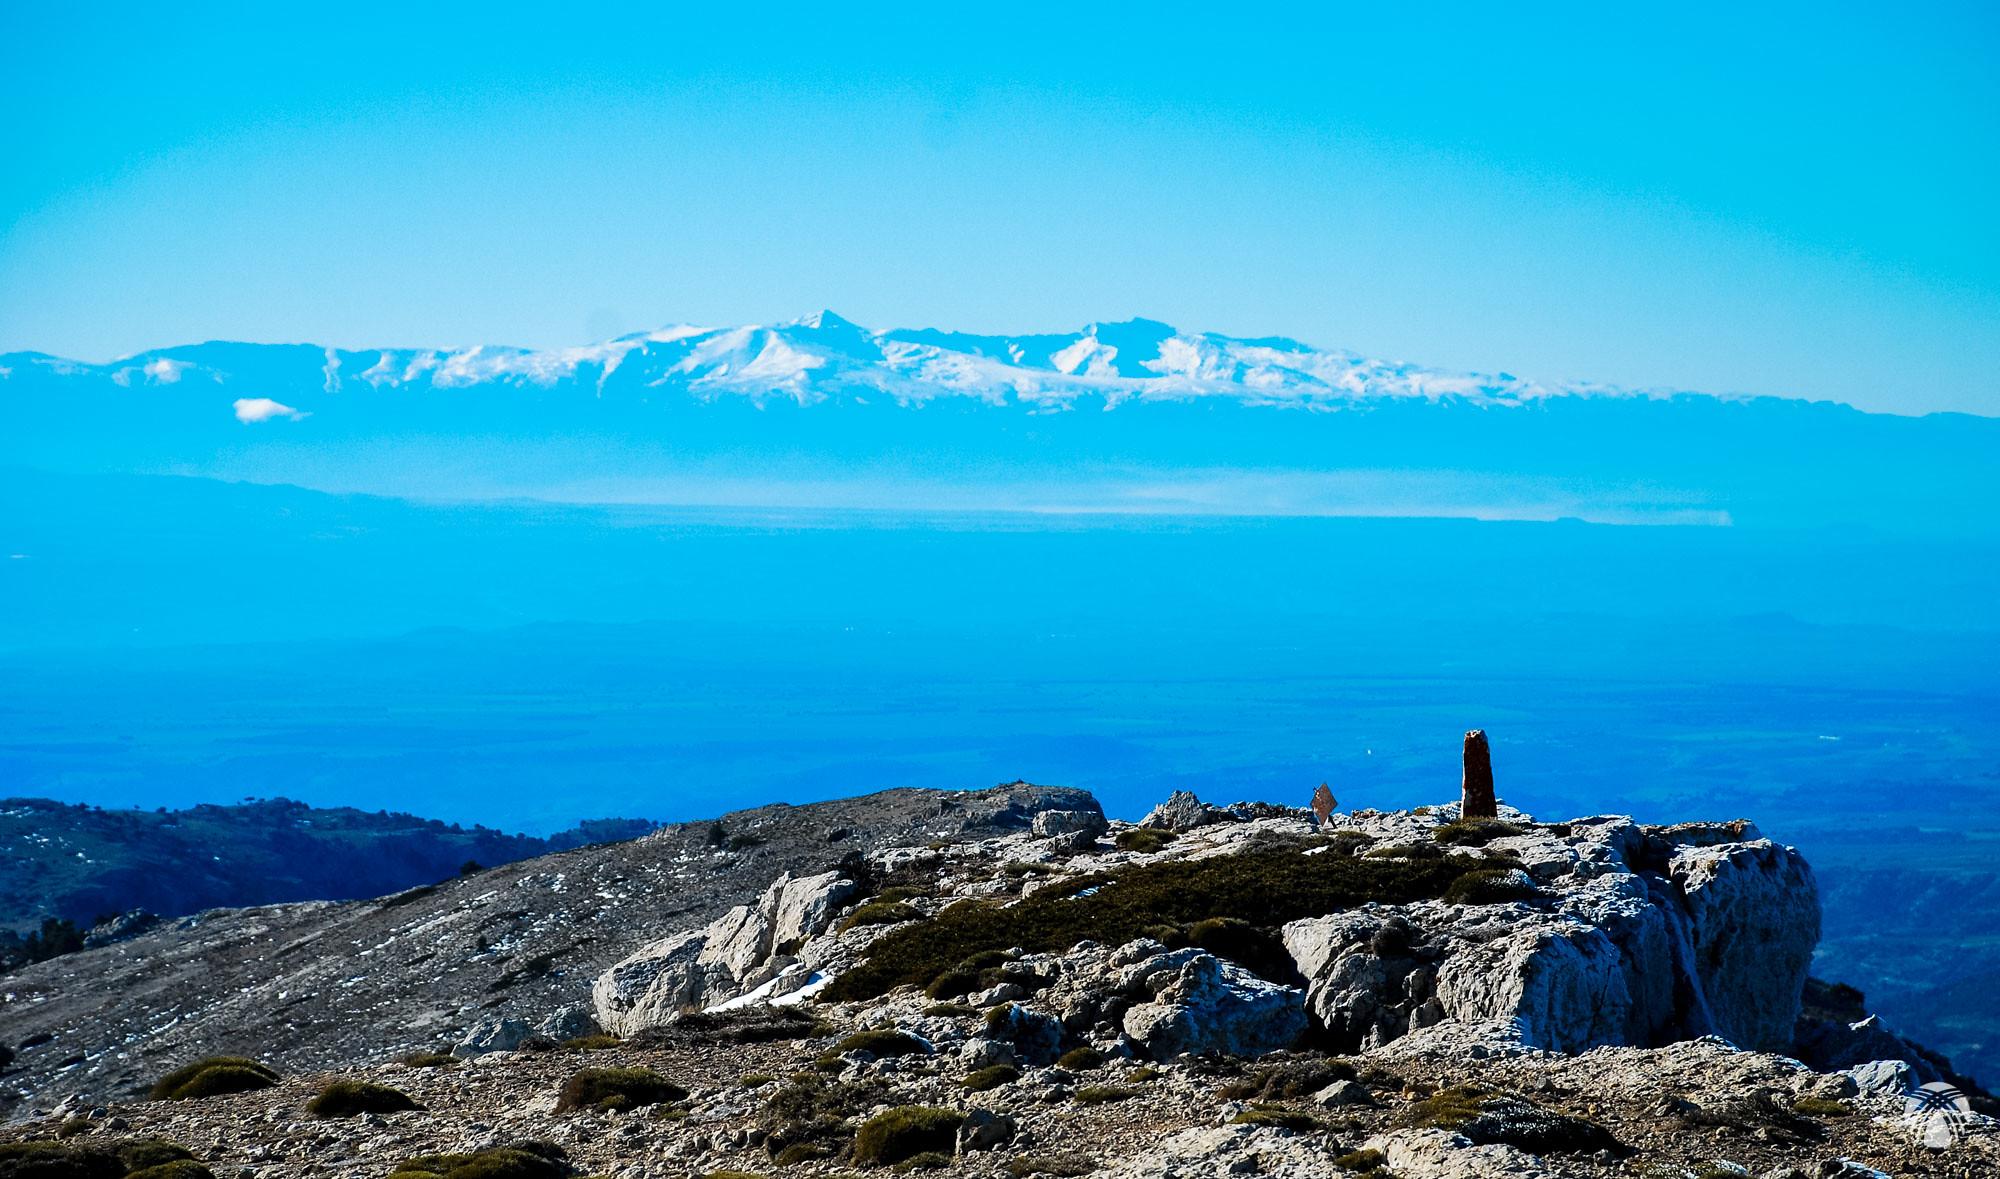 Sierra Nevada domina al sur